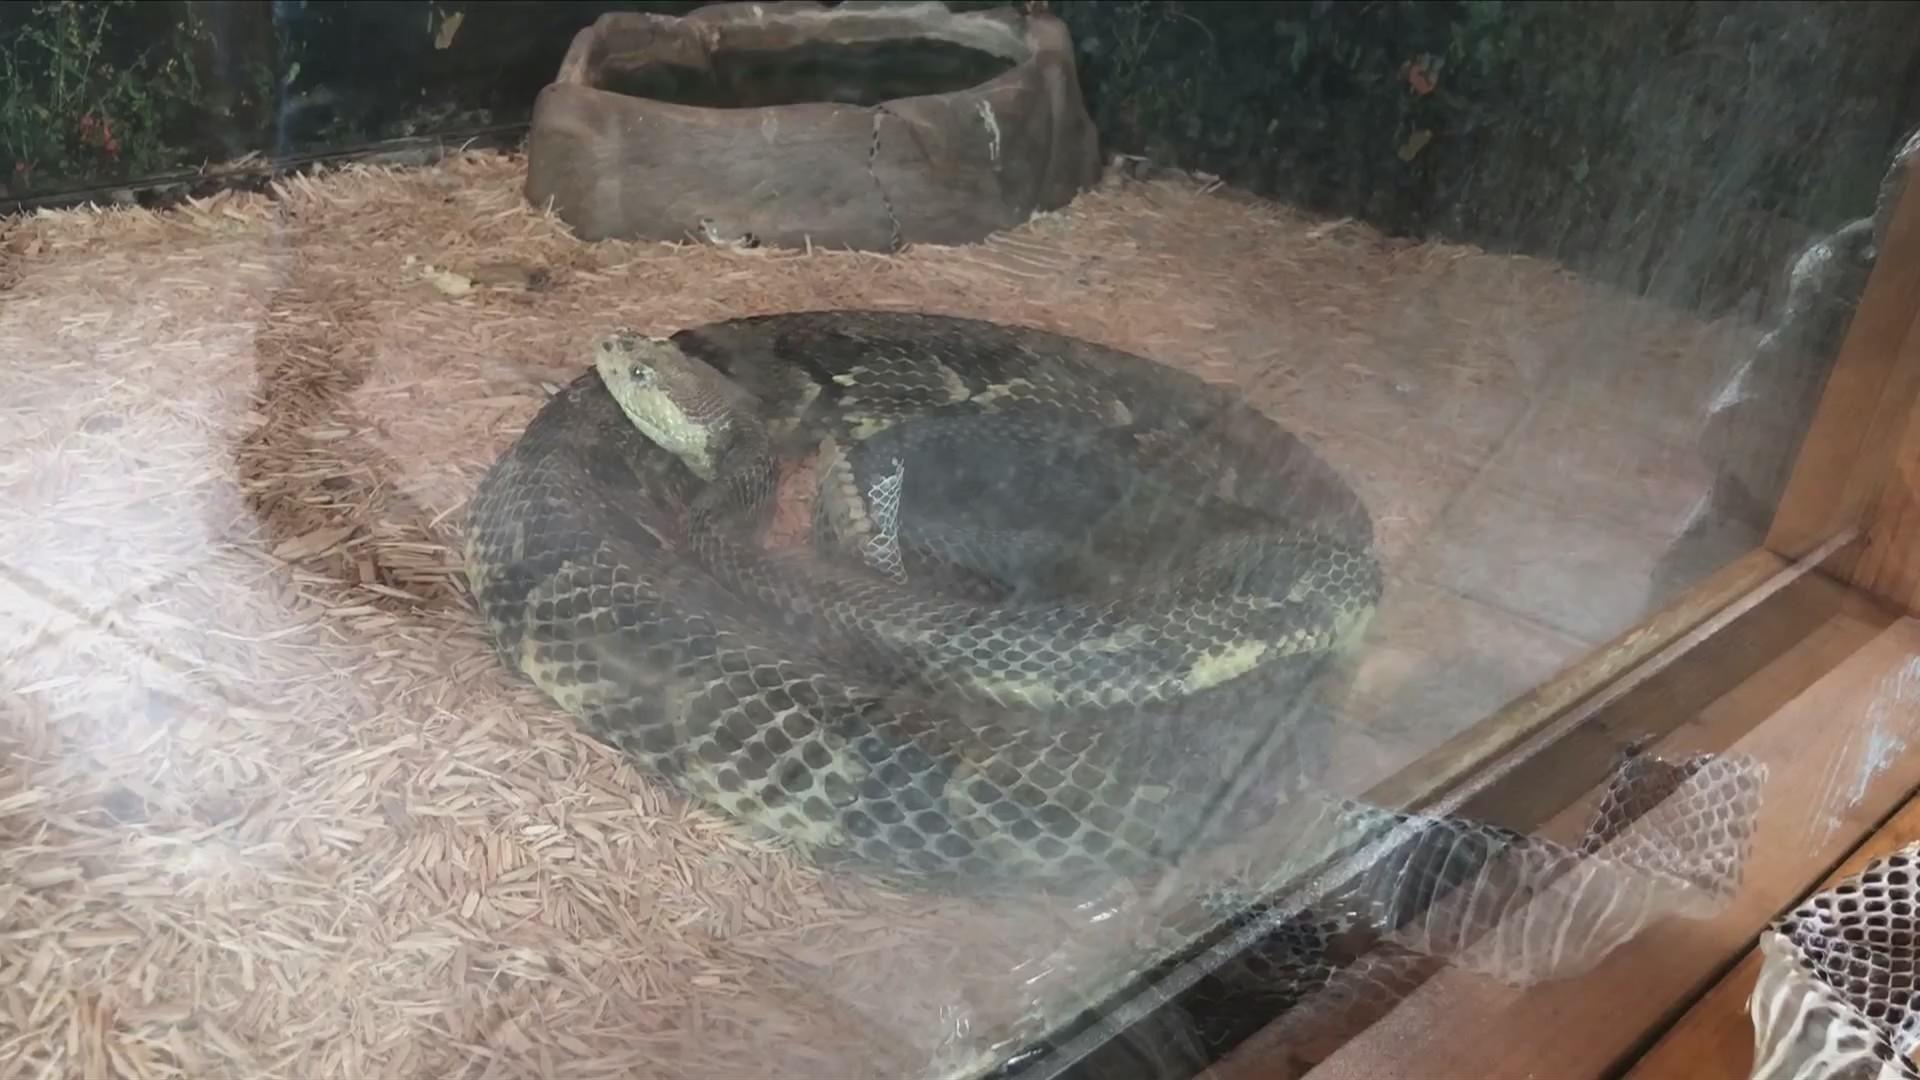 Rattlesnake season